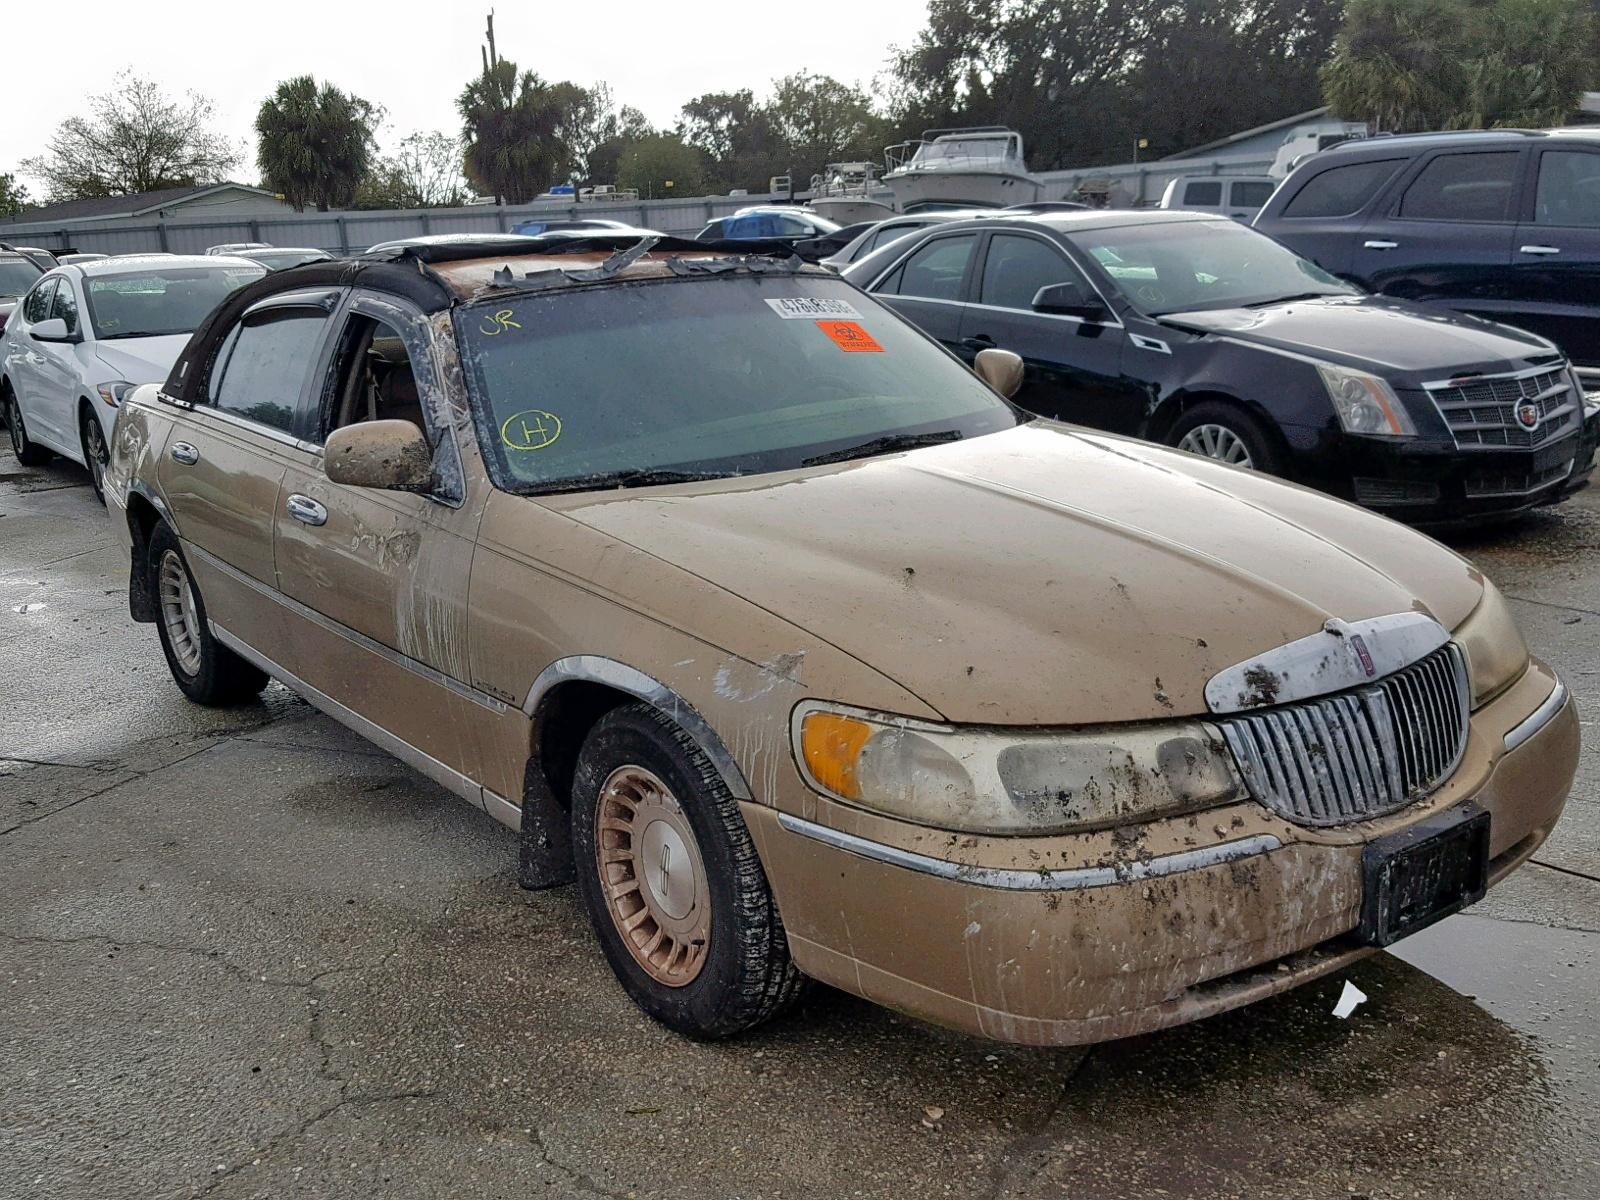 1998 Lincoln Town Car E For Sale At Copart Punta Gorda Fl Lot 47608598